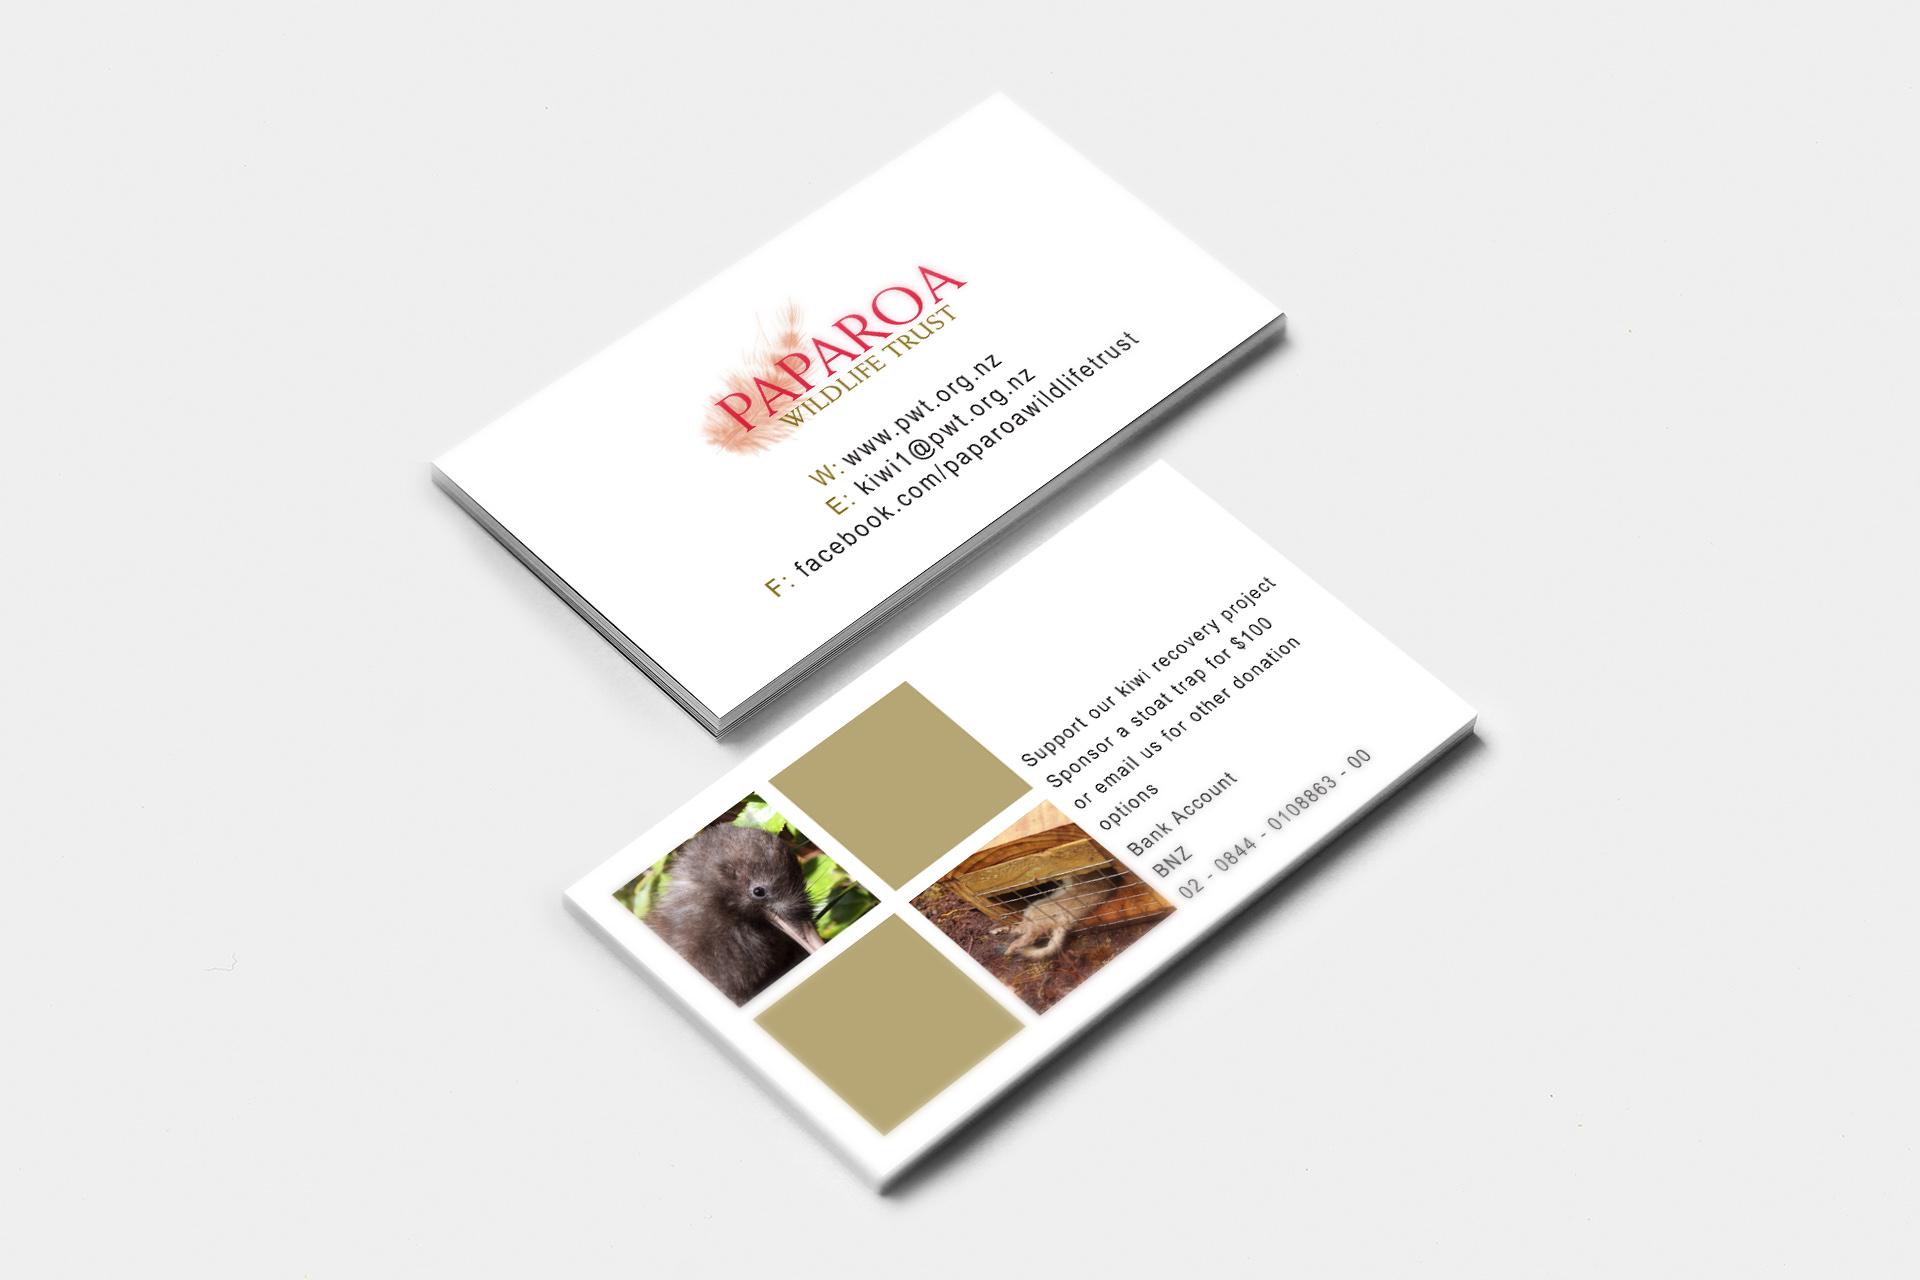 Paparoa Wildlife Trust Information Card Design